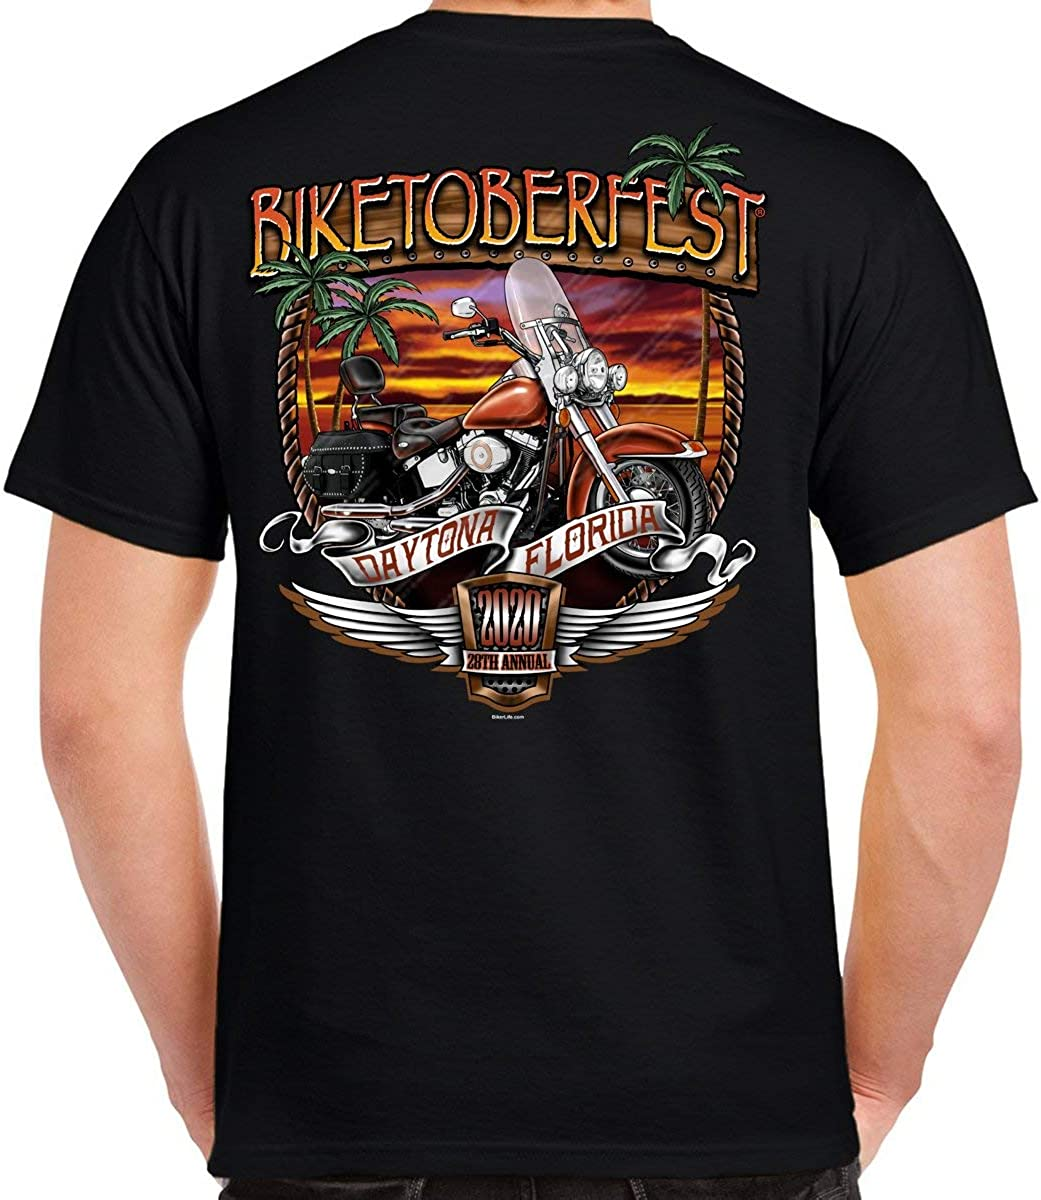 2020 Biketoberfest Daytona Beach Sunset Bike Shield T-Shirt